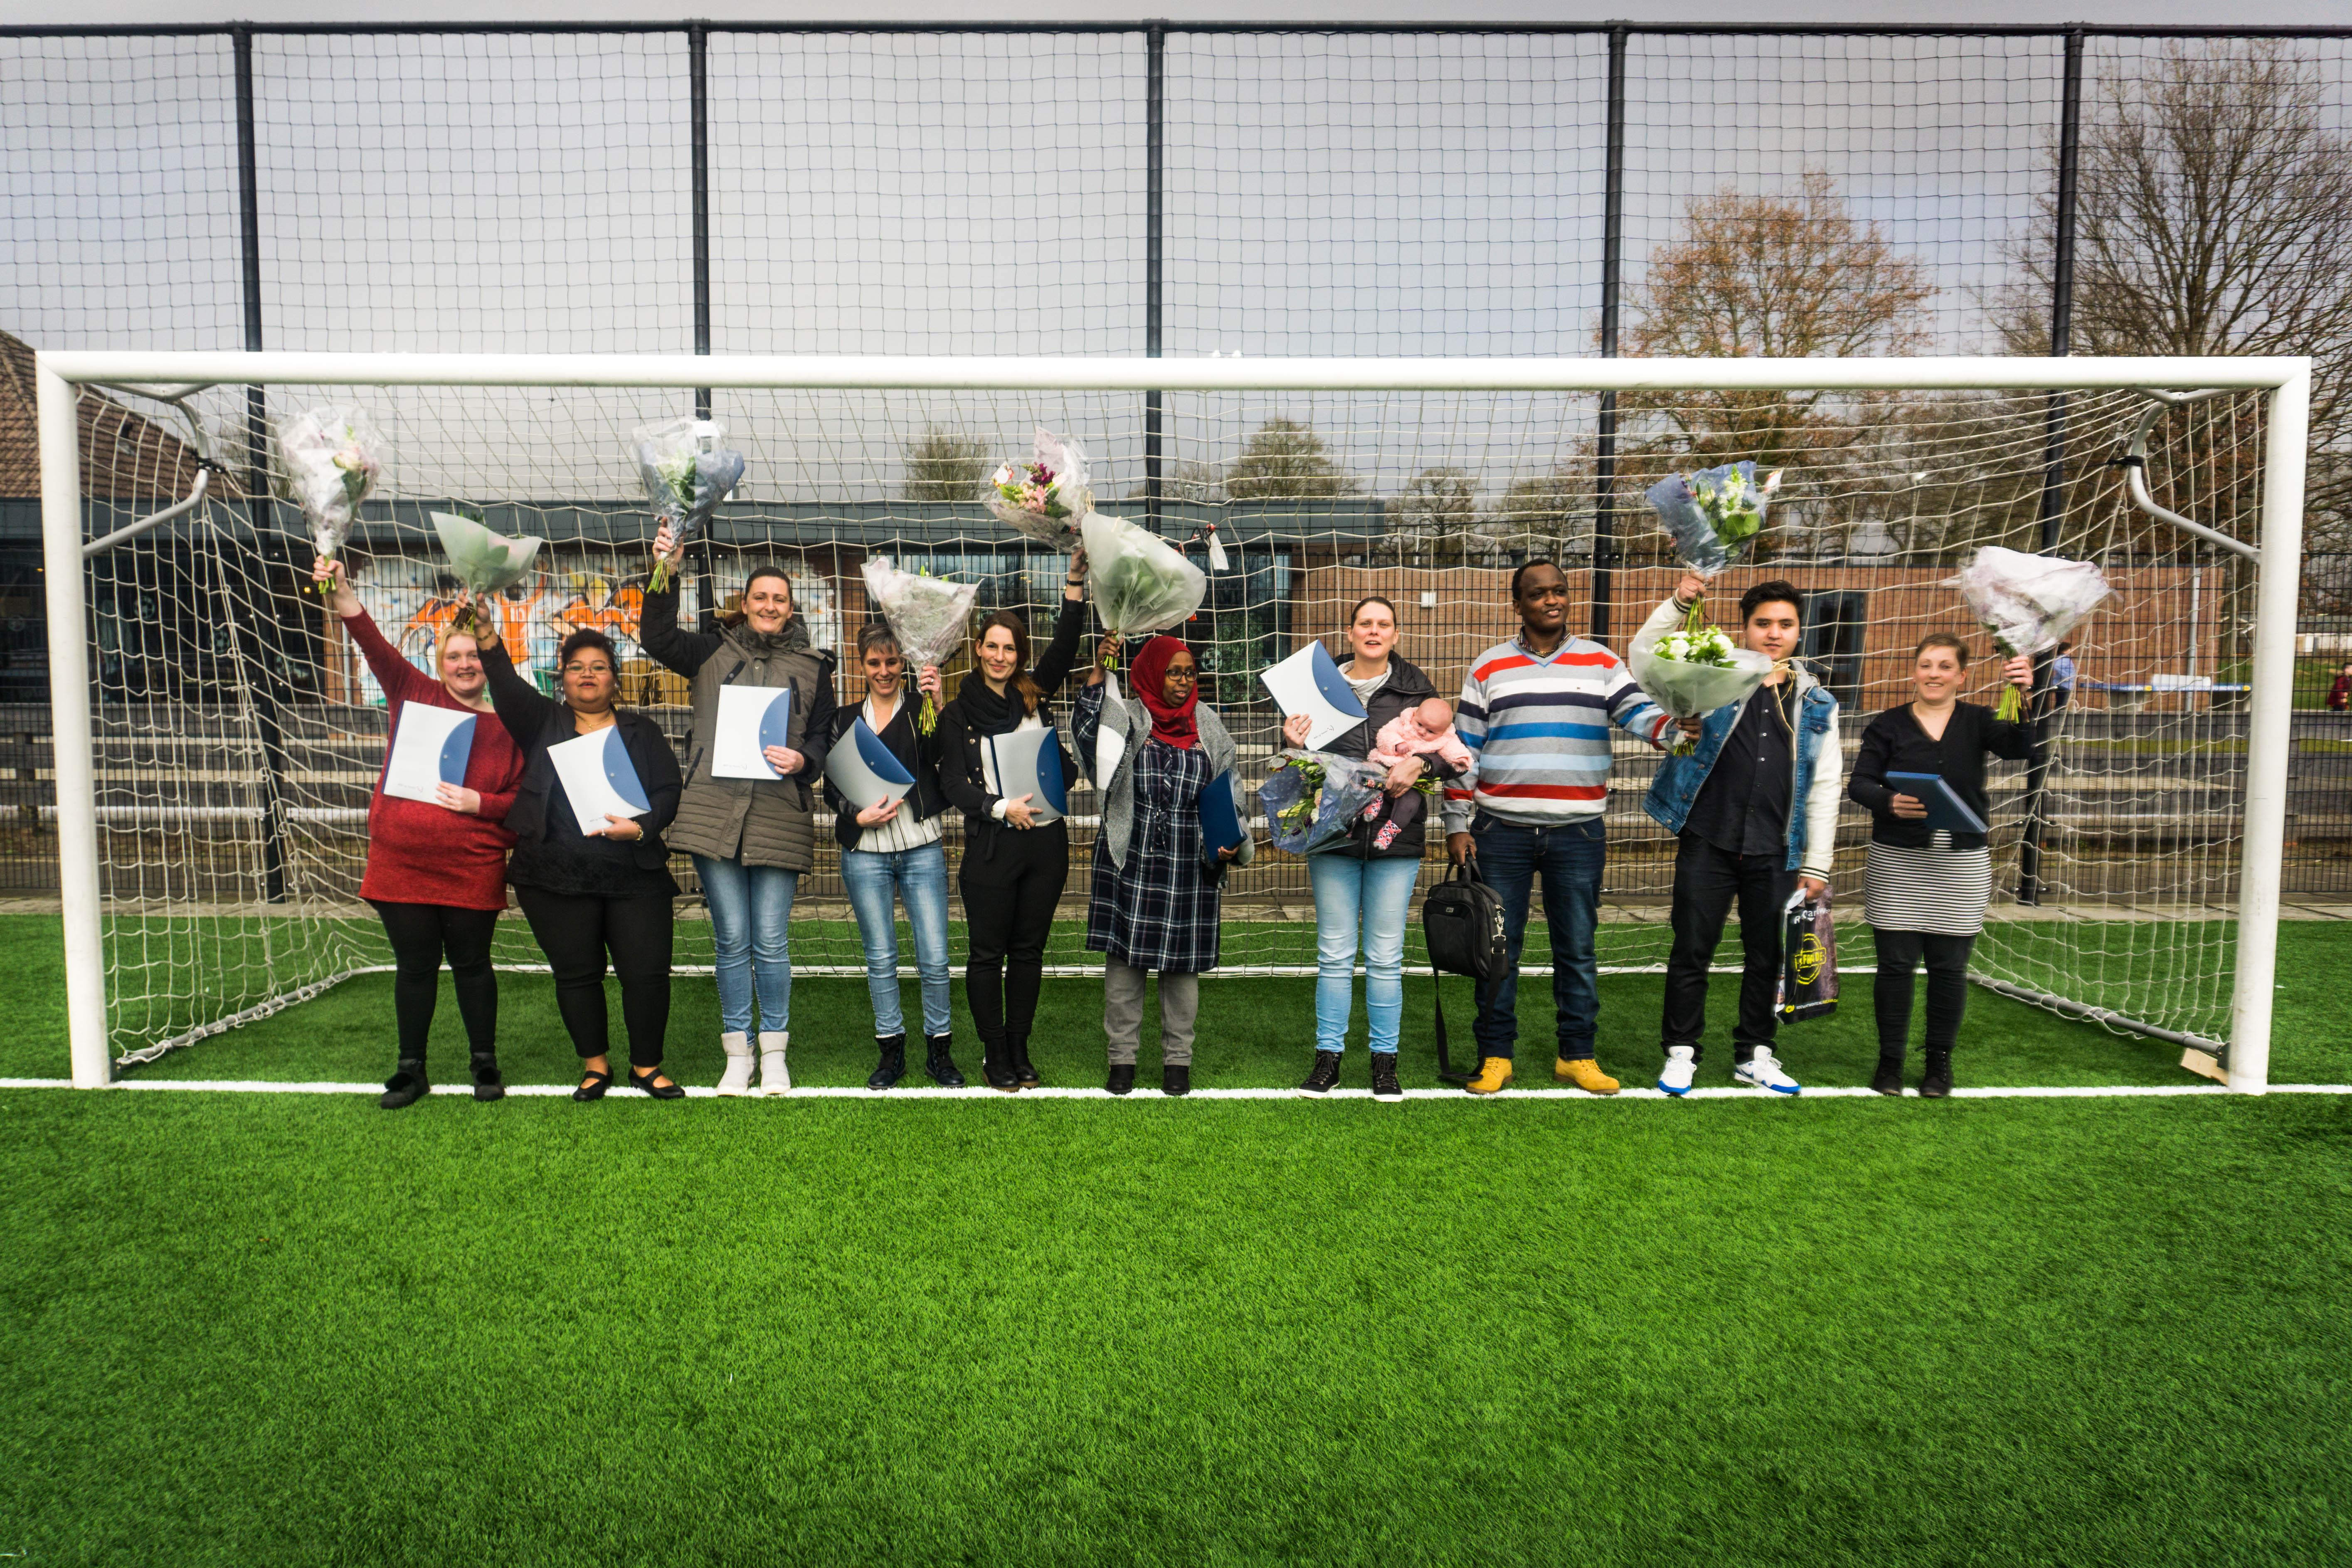 Studenten Scoren Diploma Bij Sportvereniging